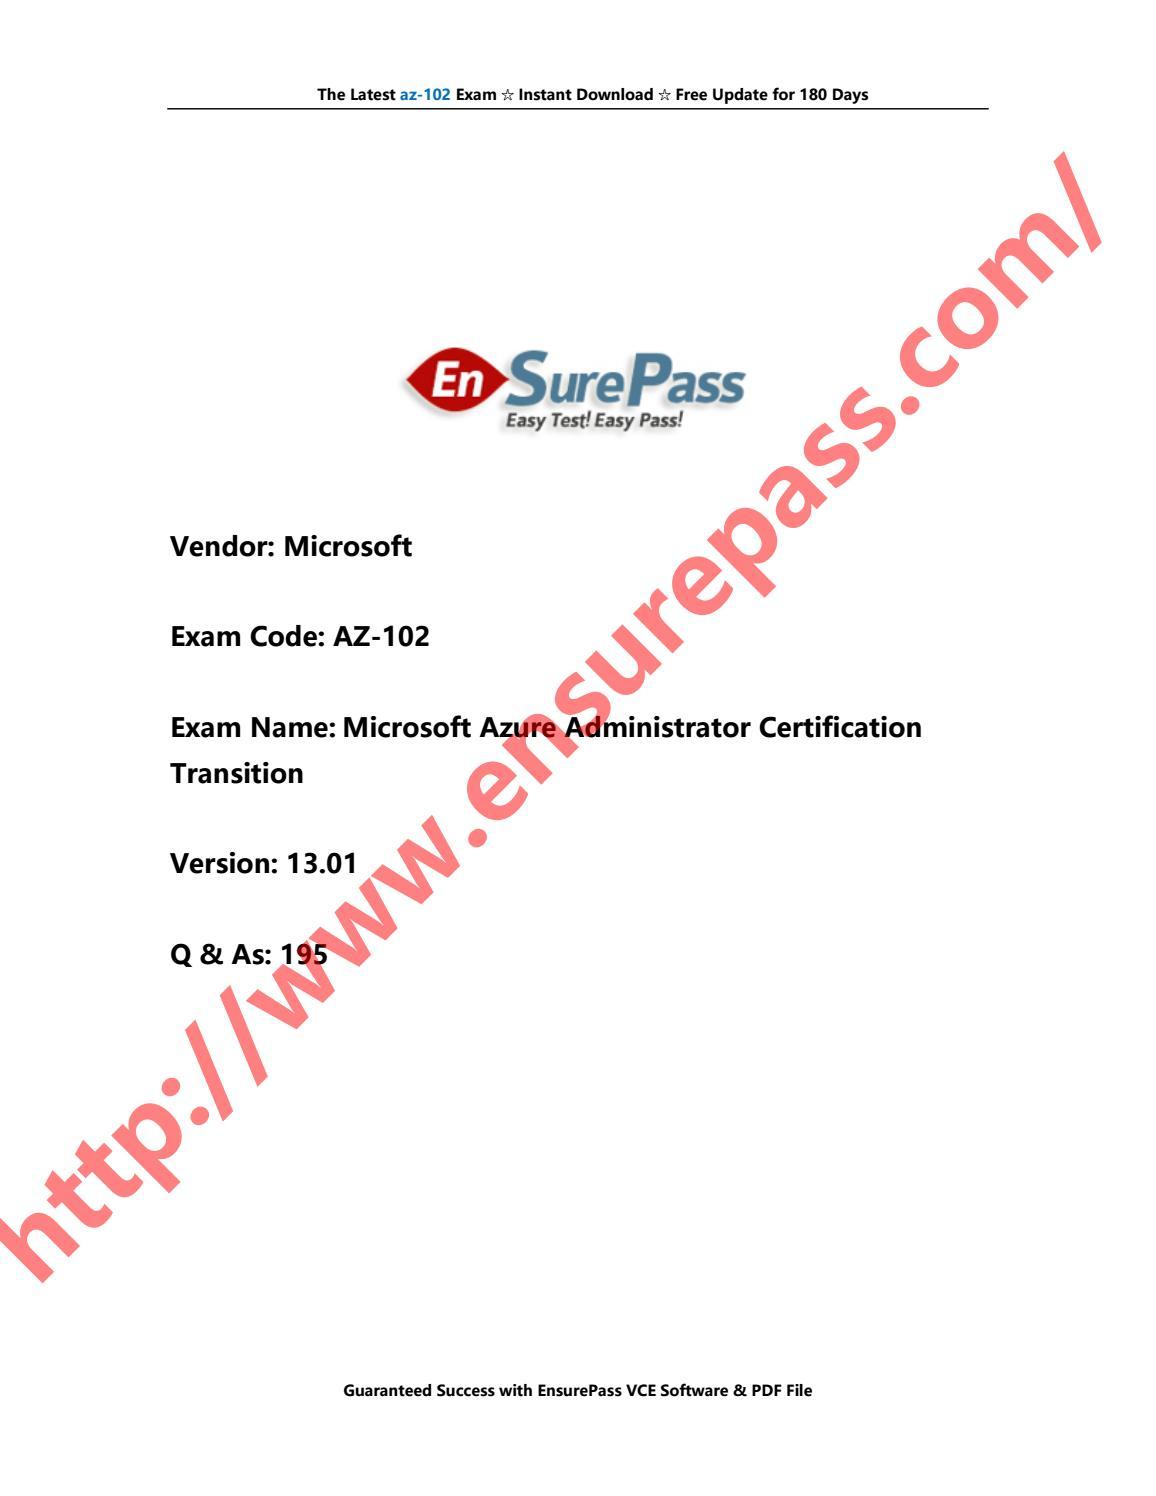 Ensurepass Microsoft AZ-102 V13 01 195Q by